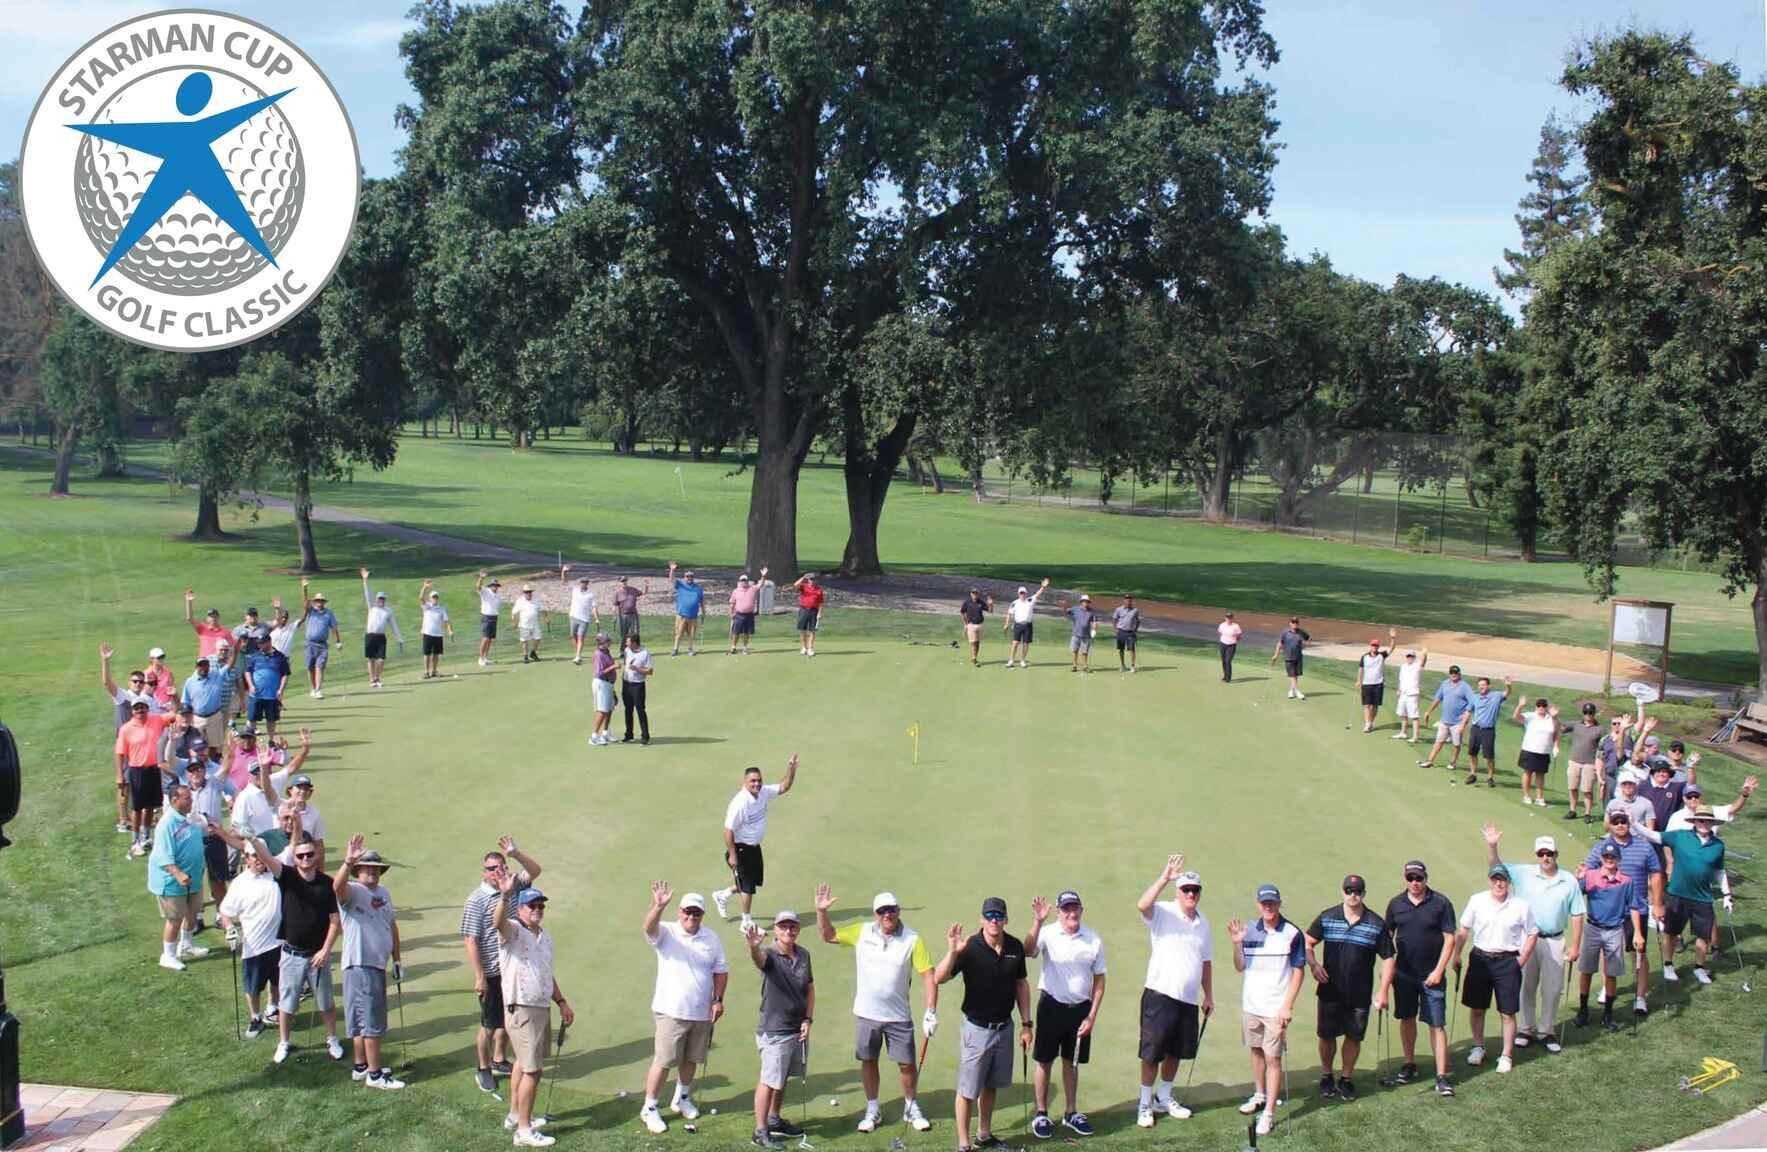 Starman Cup Annual Golf Classic  image